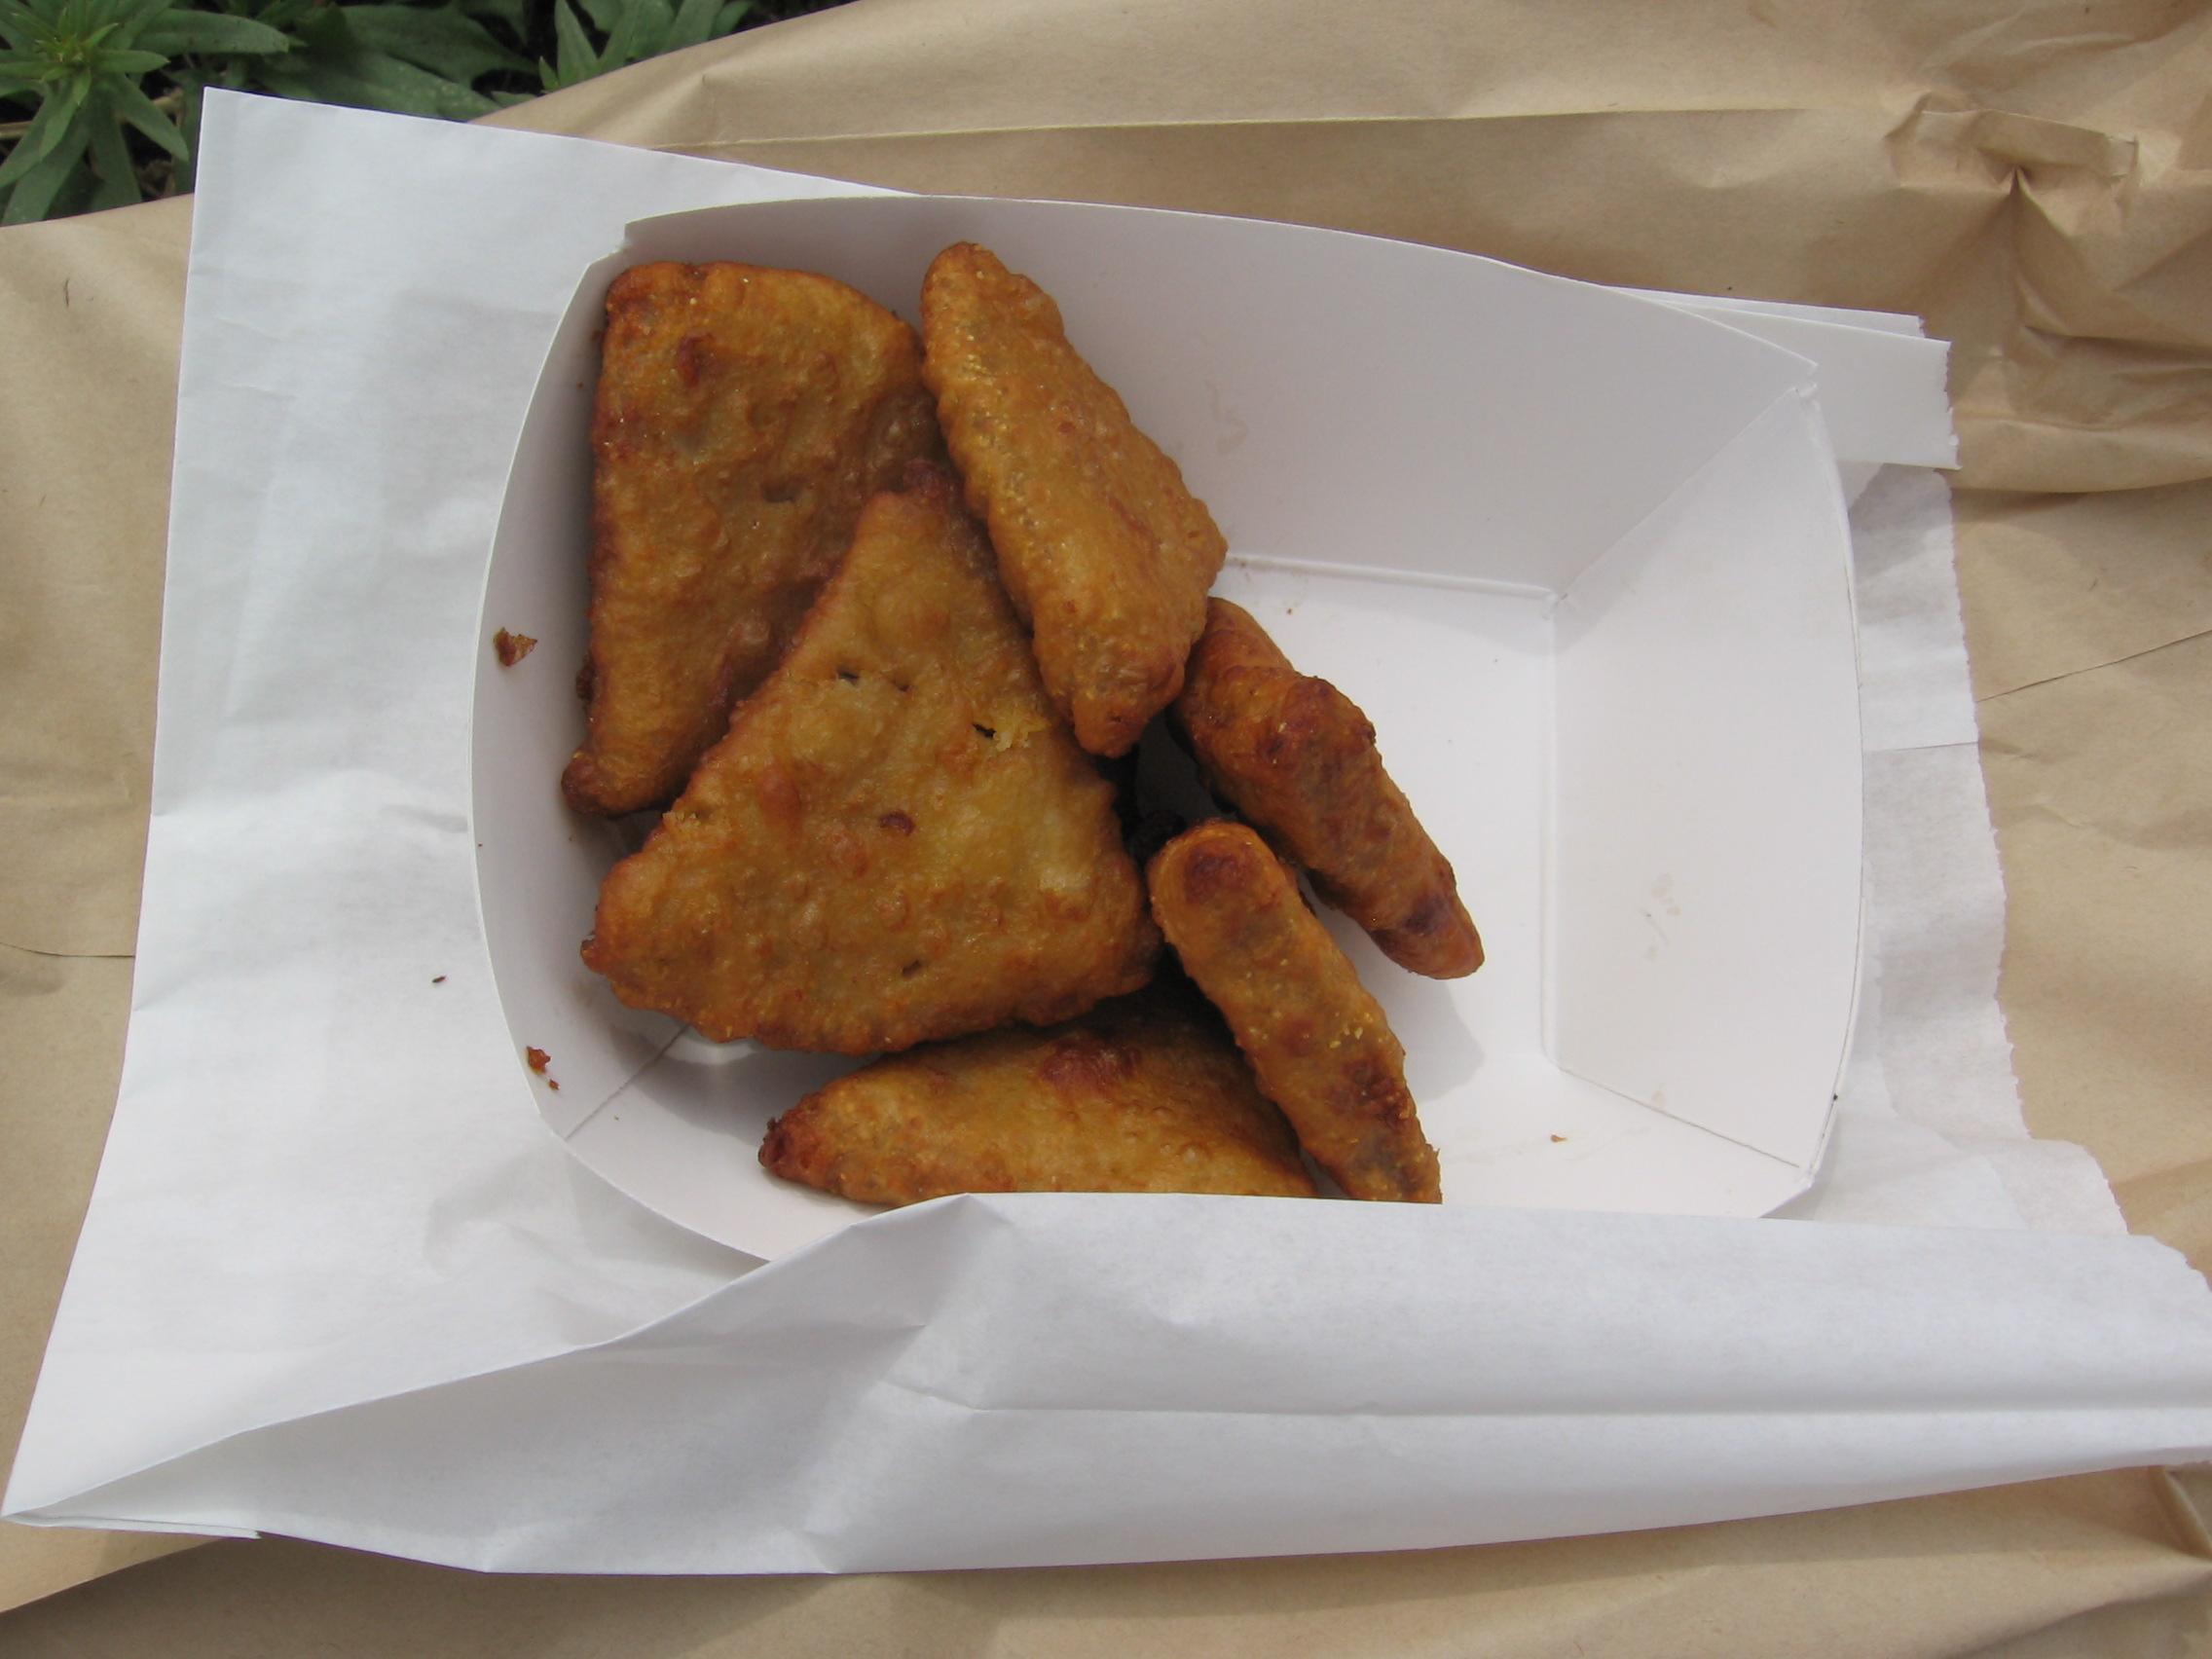 Pork nuggets from Pork Chop John's